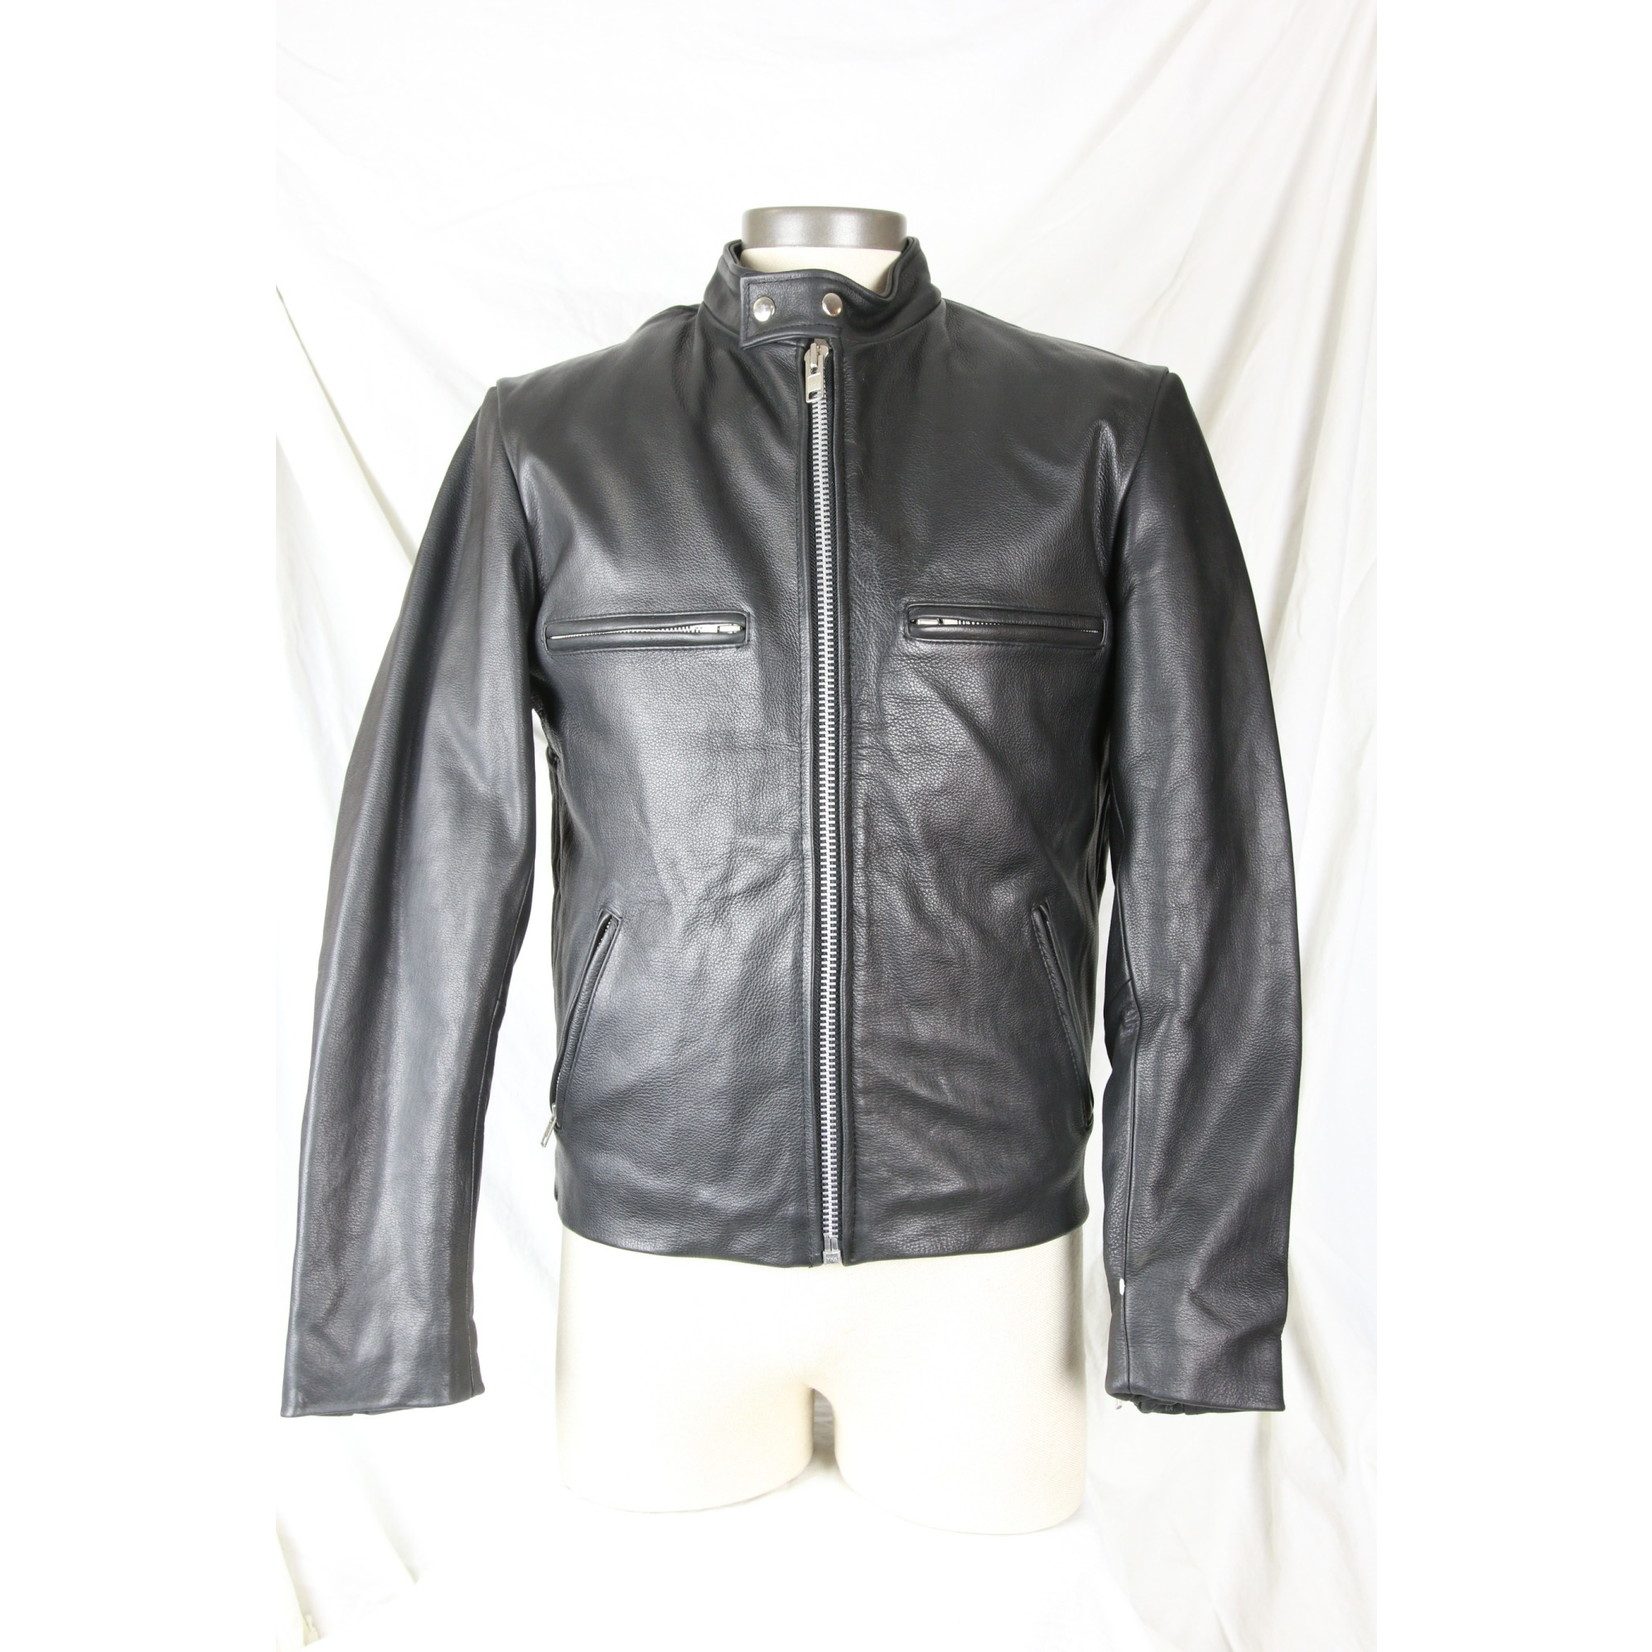 Cruiser by Safari Men's Biker Jacket Black Built-in Neck Warmer Zip-Out Liner Nehru Collar Leather